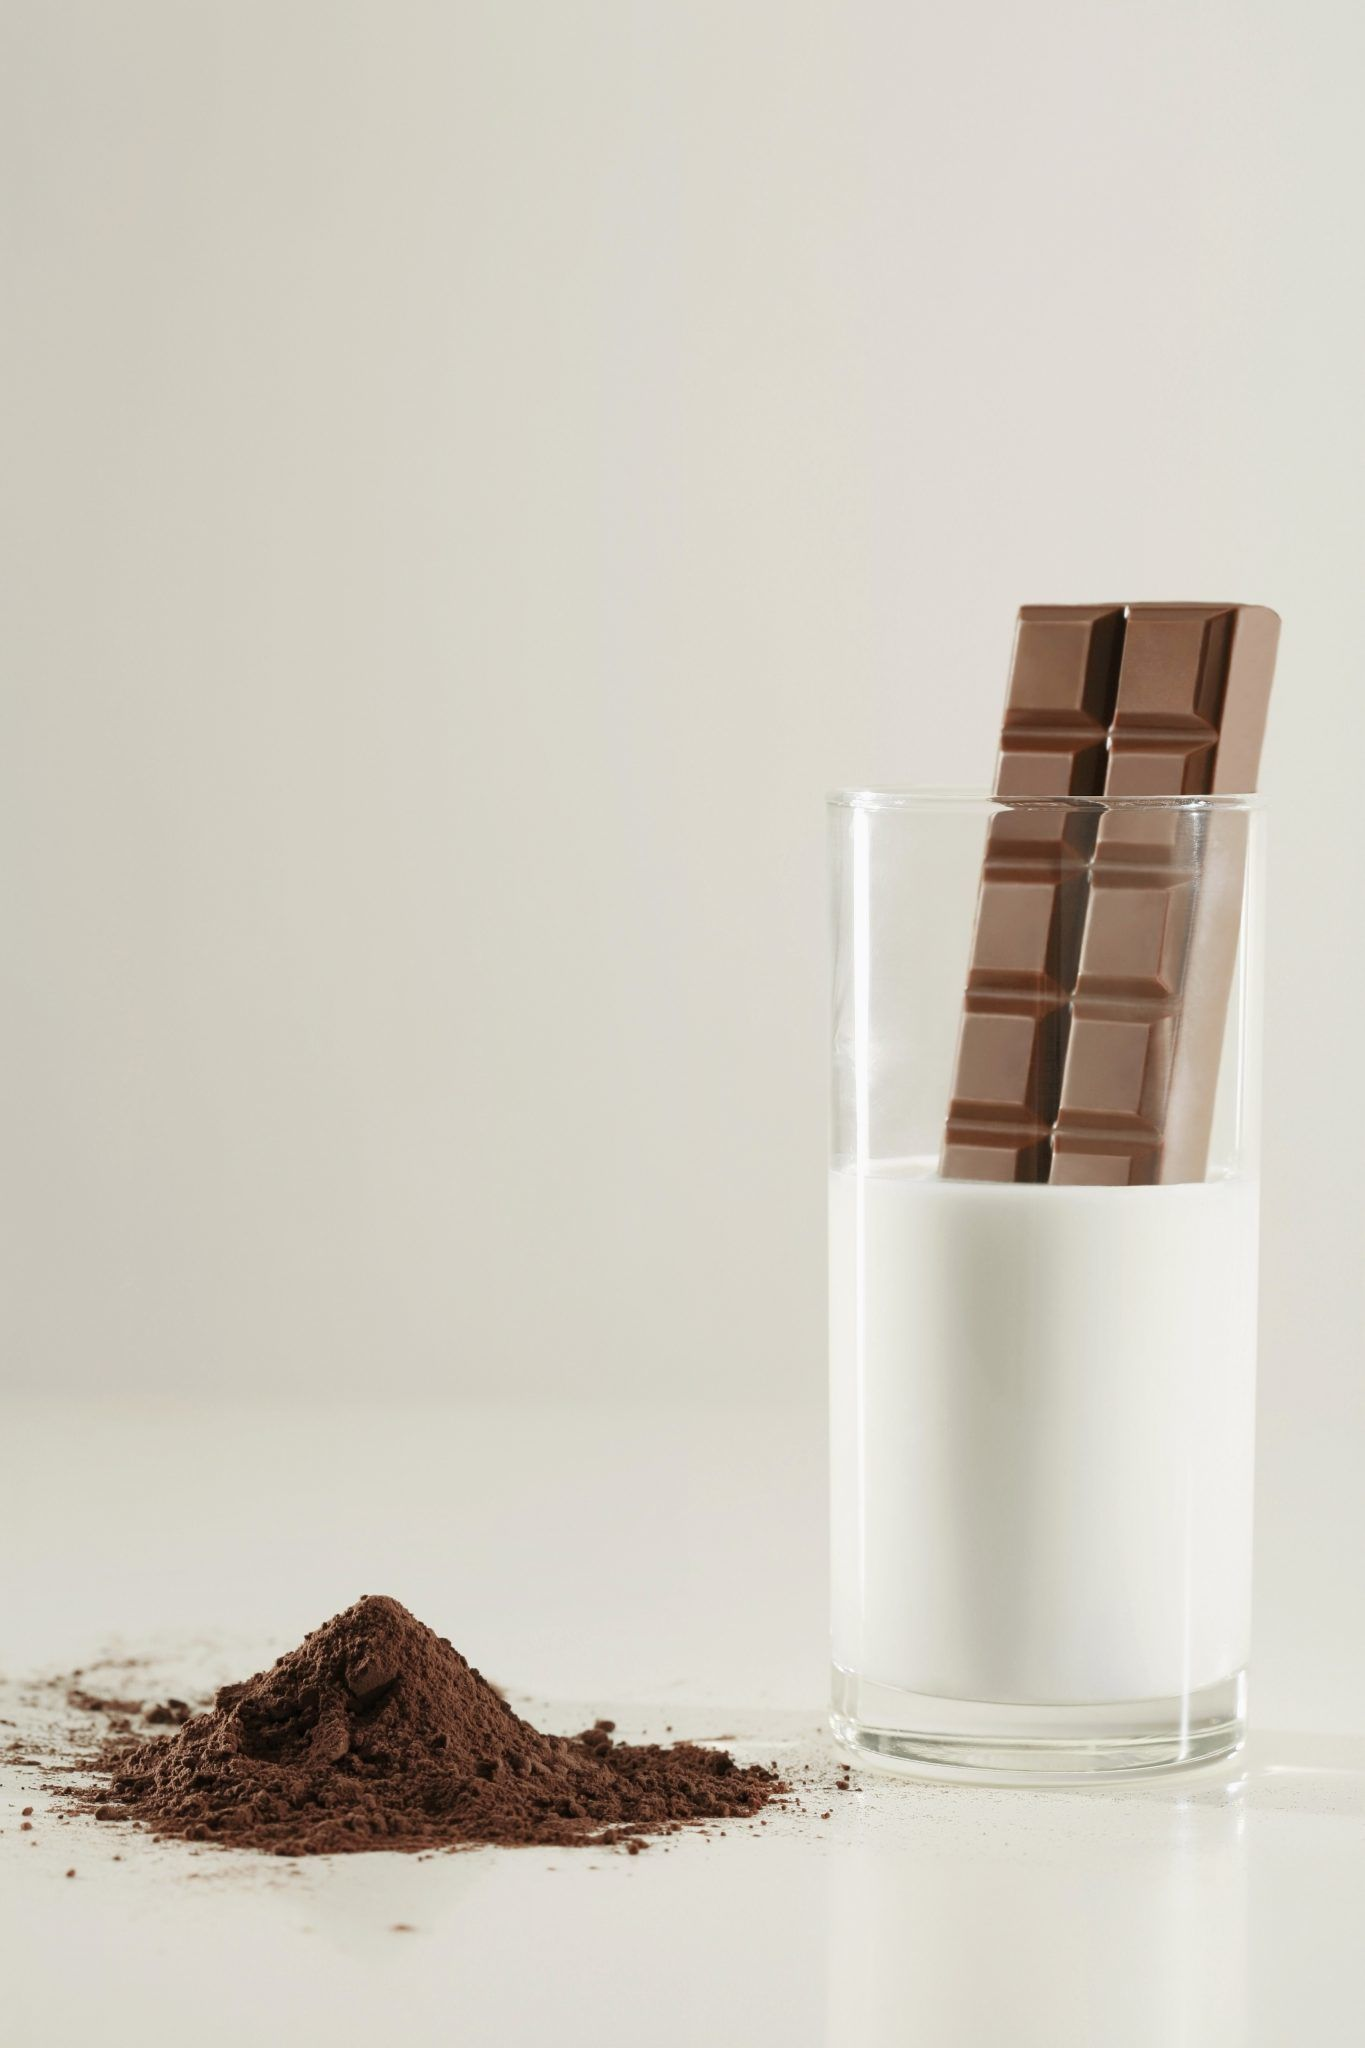 Schokolade in der Schwangerschaft